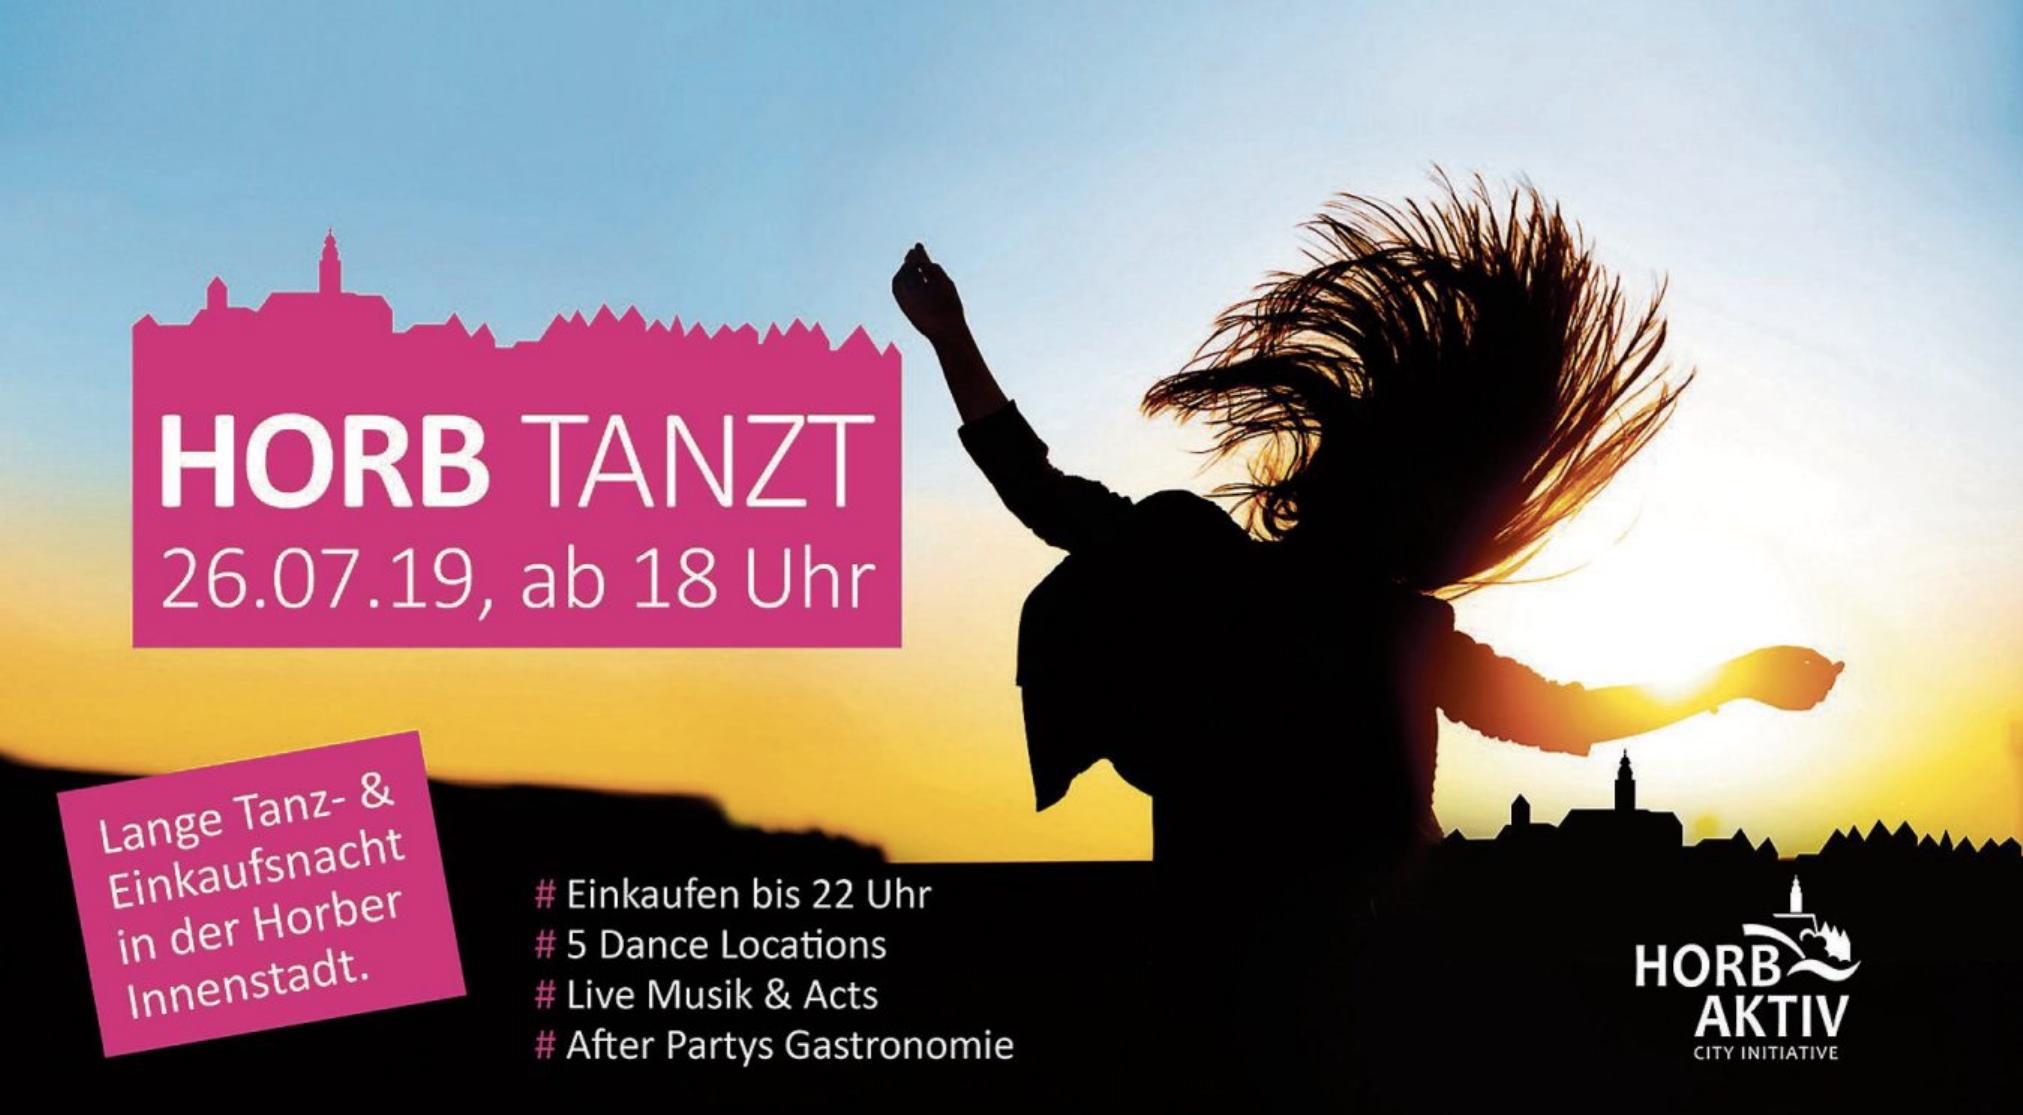 Horb Tanzt